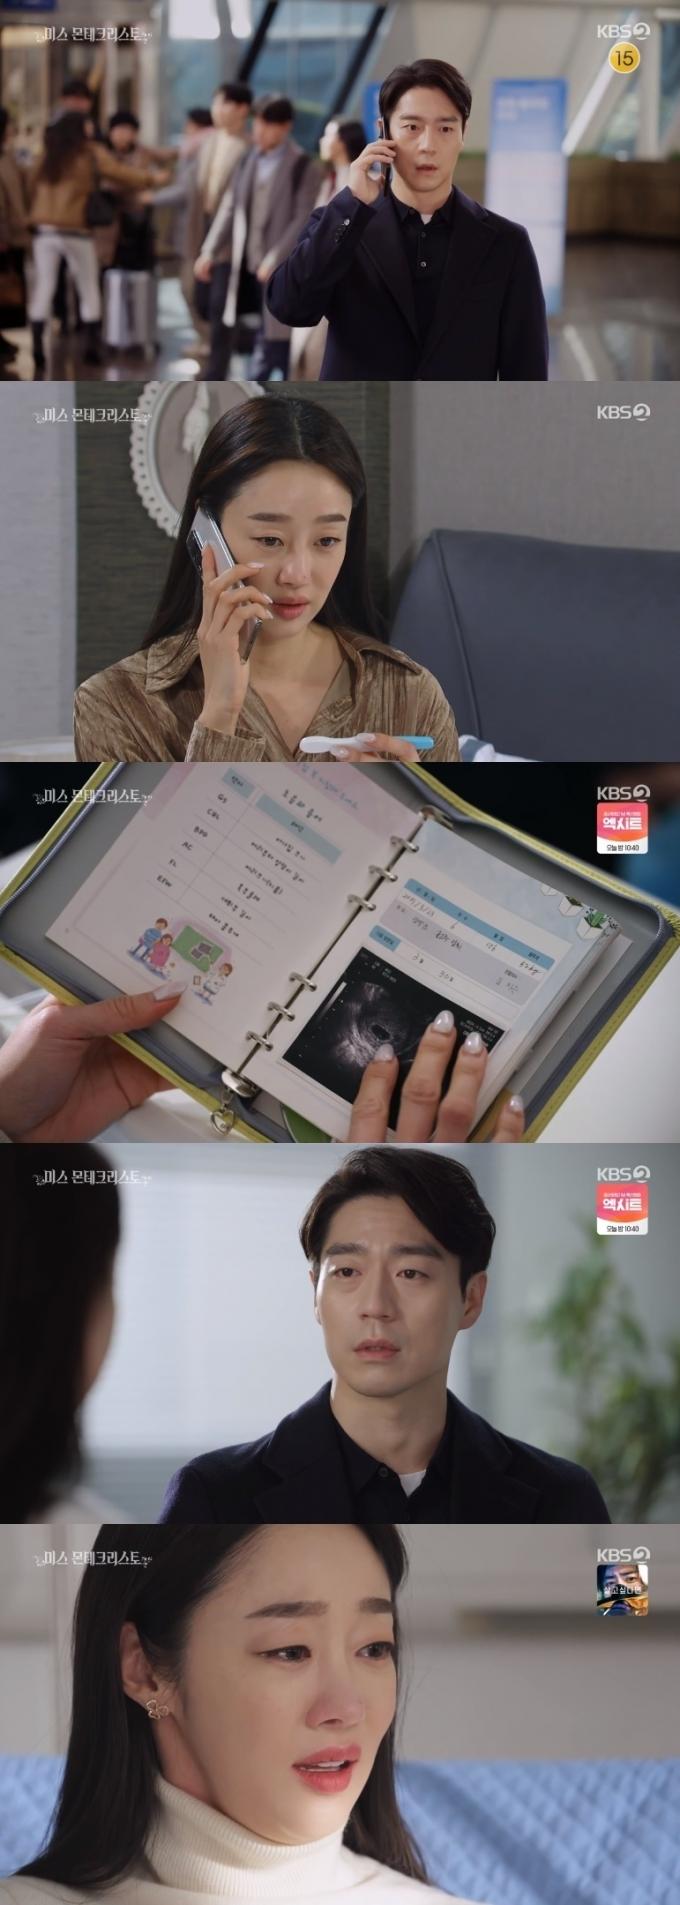 KBS 2TV '미스 몬테크리스토' 캡처 © 뉴스1